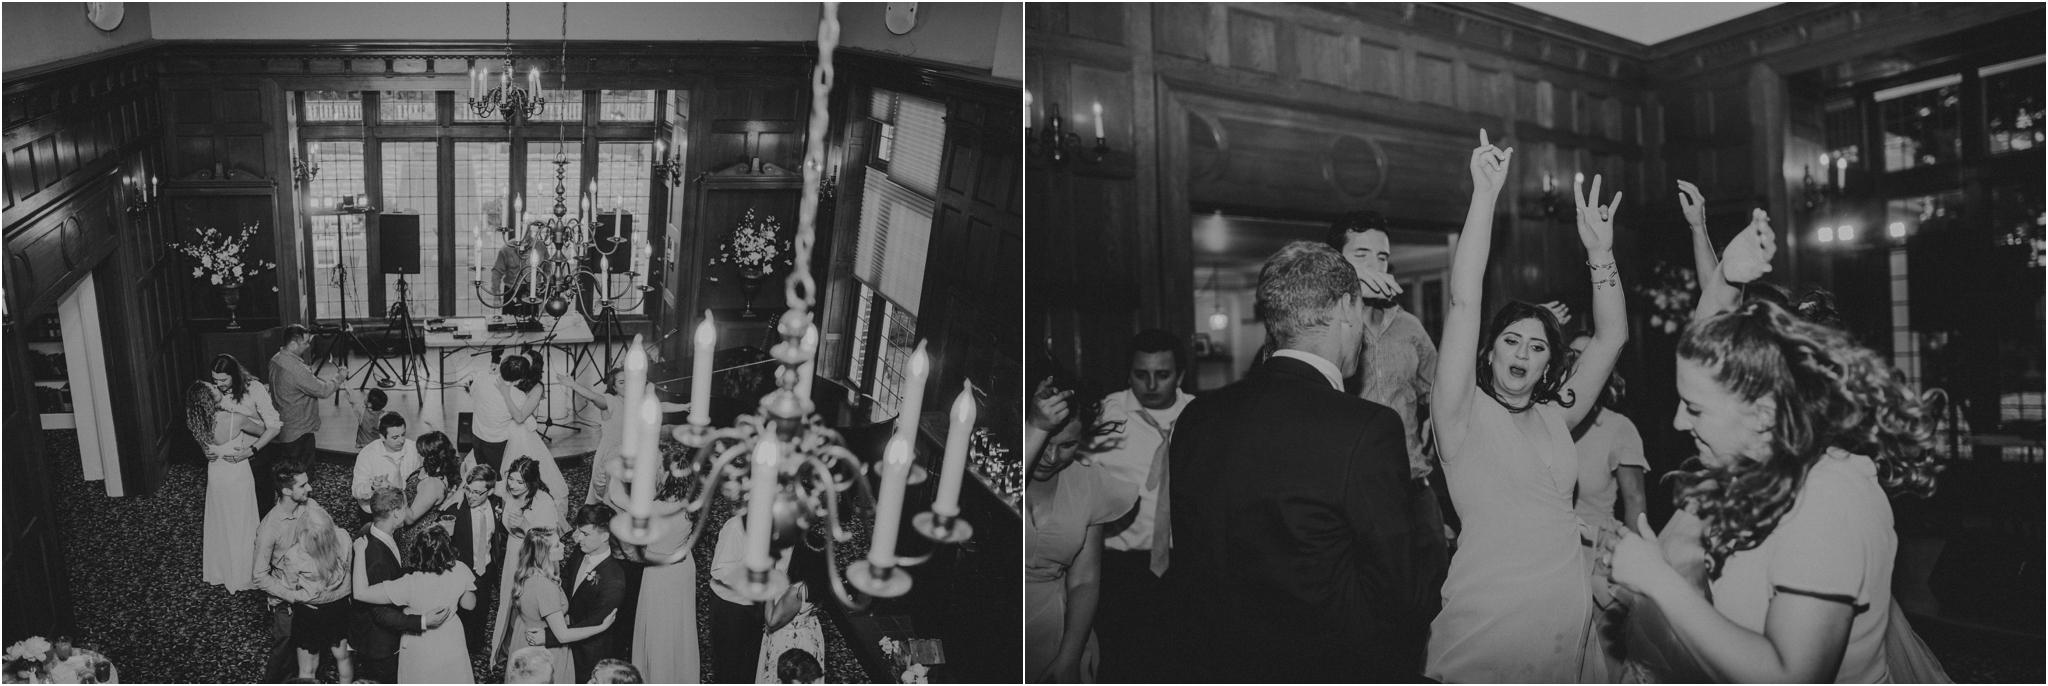 chance-and-ondrea-lairmont-manor-wedding-seattle-photographer-142.jpg